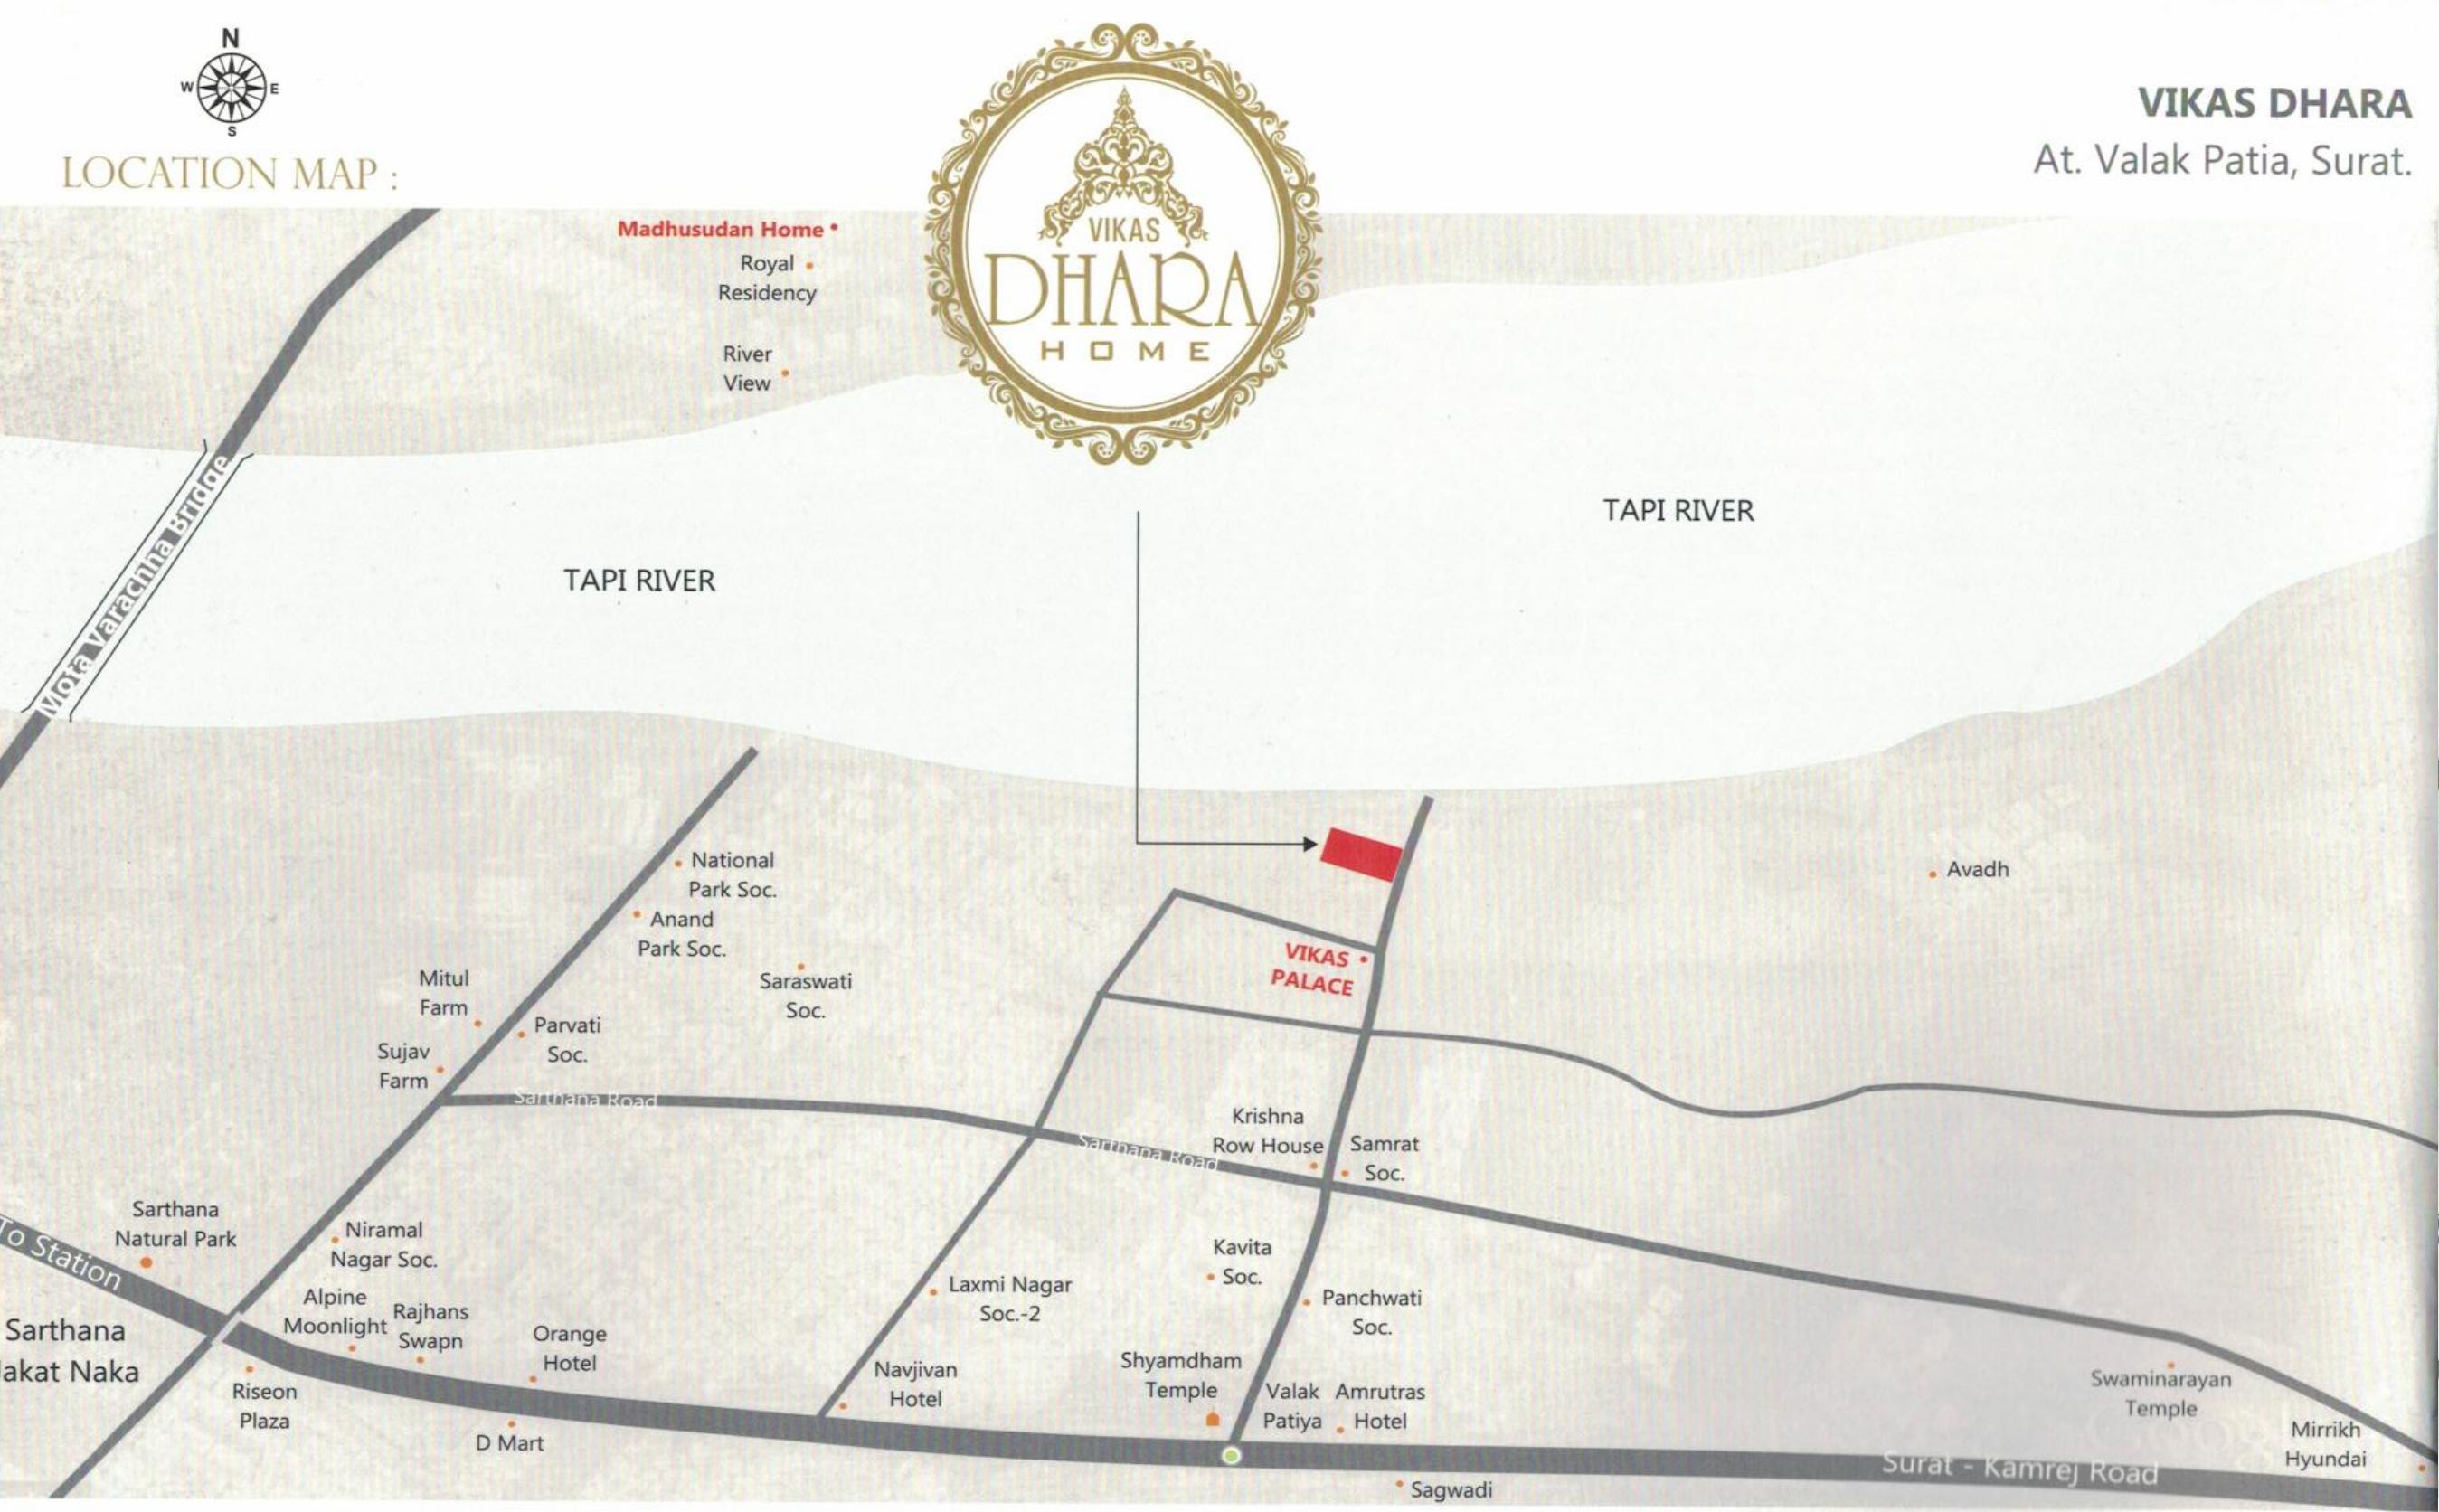 6b298dac992 Vikas Dhara HomeNeighbourhood .